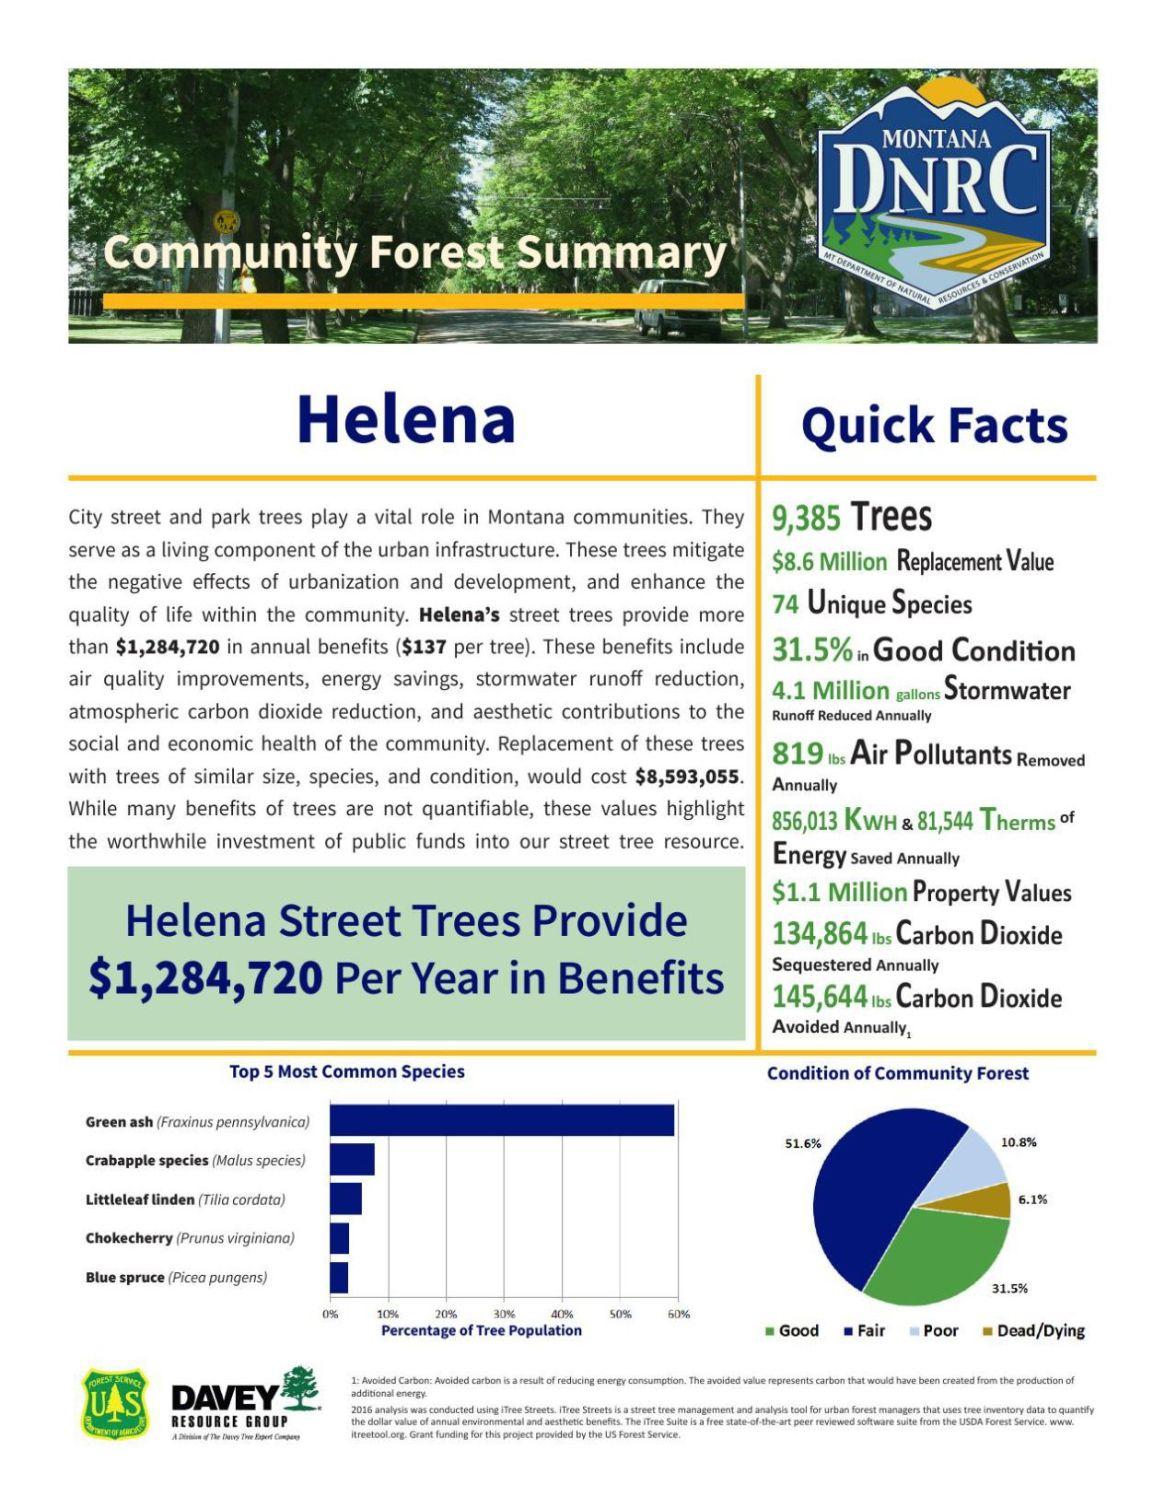 Community Forest Survey - Helena